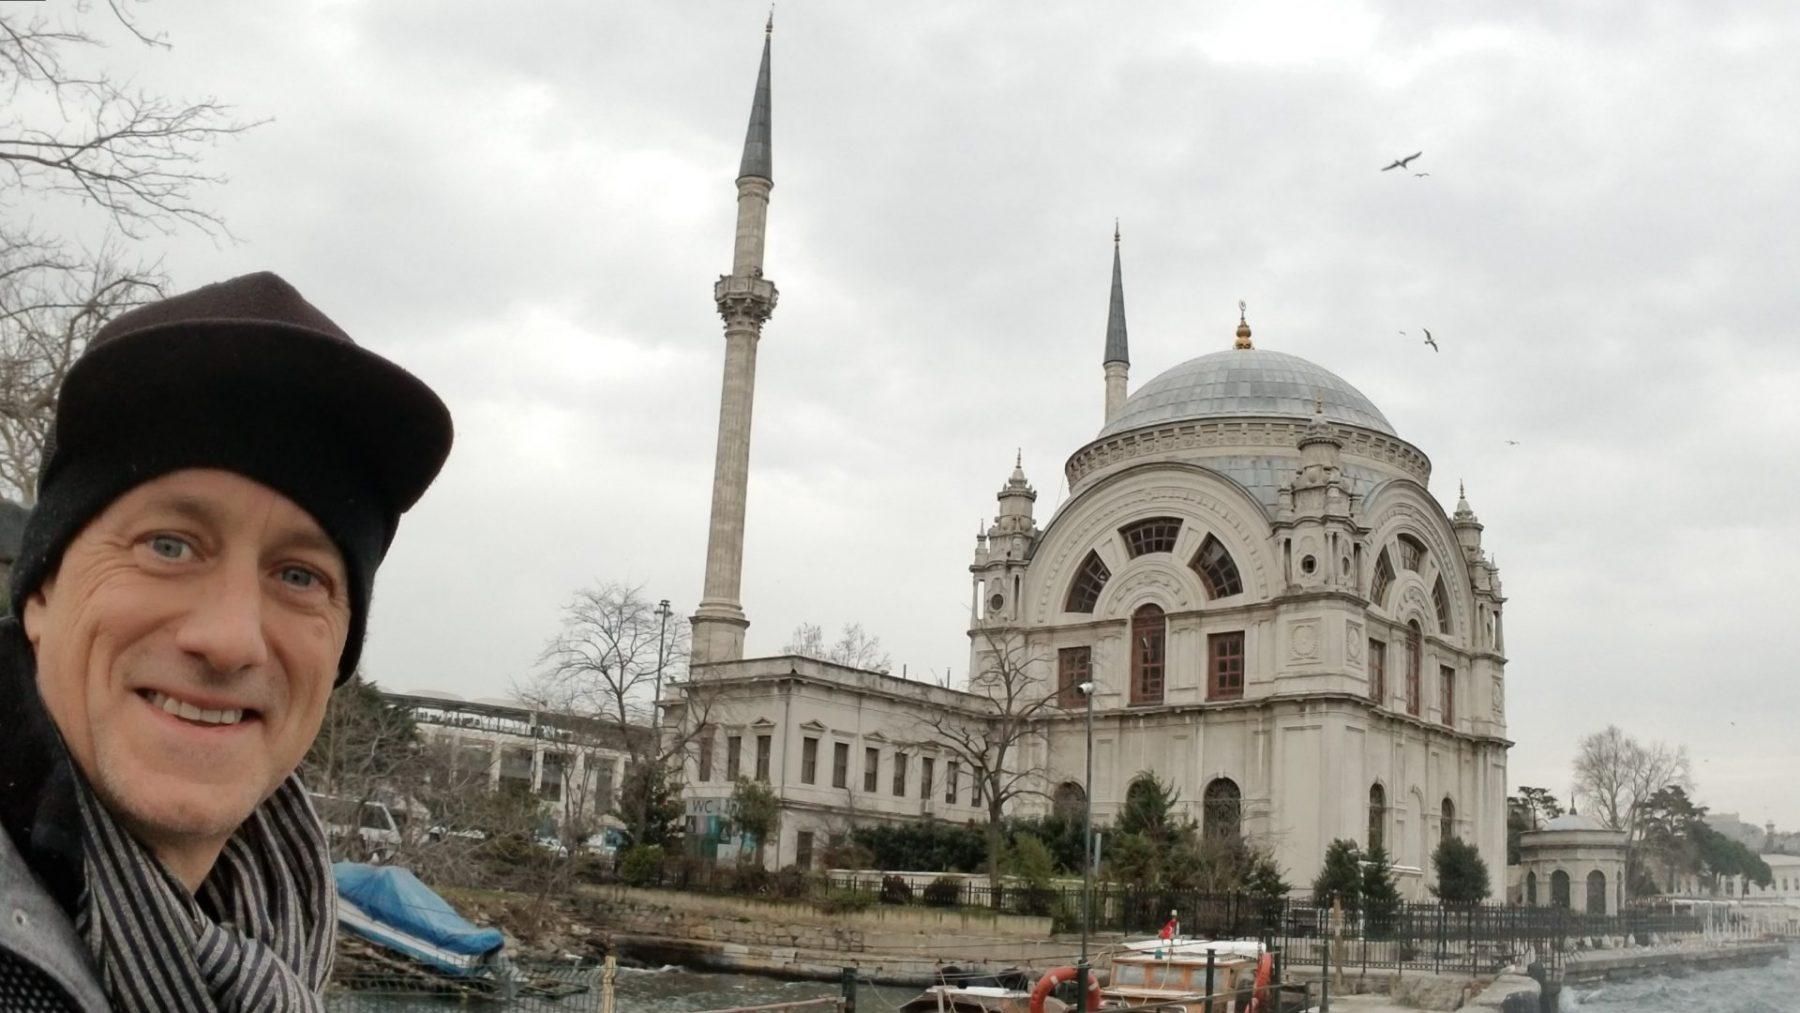 Michael Scott Novilla 2019 01-24 Istanbul Dolmabahce Palace